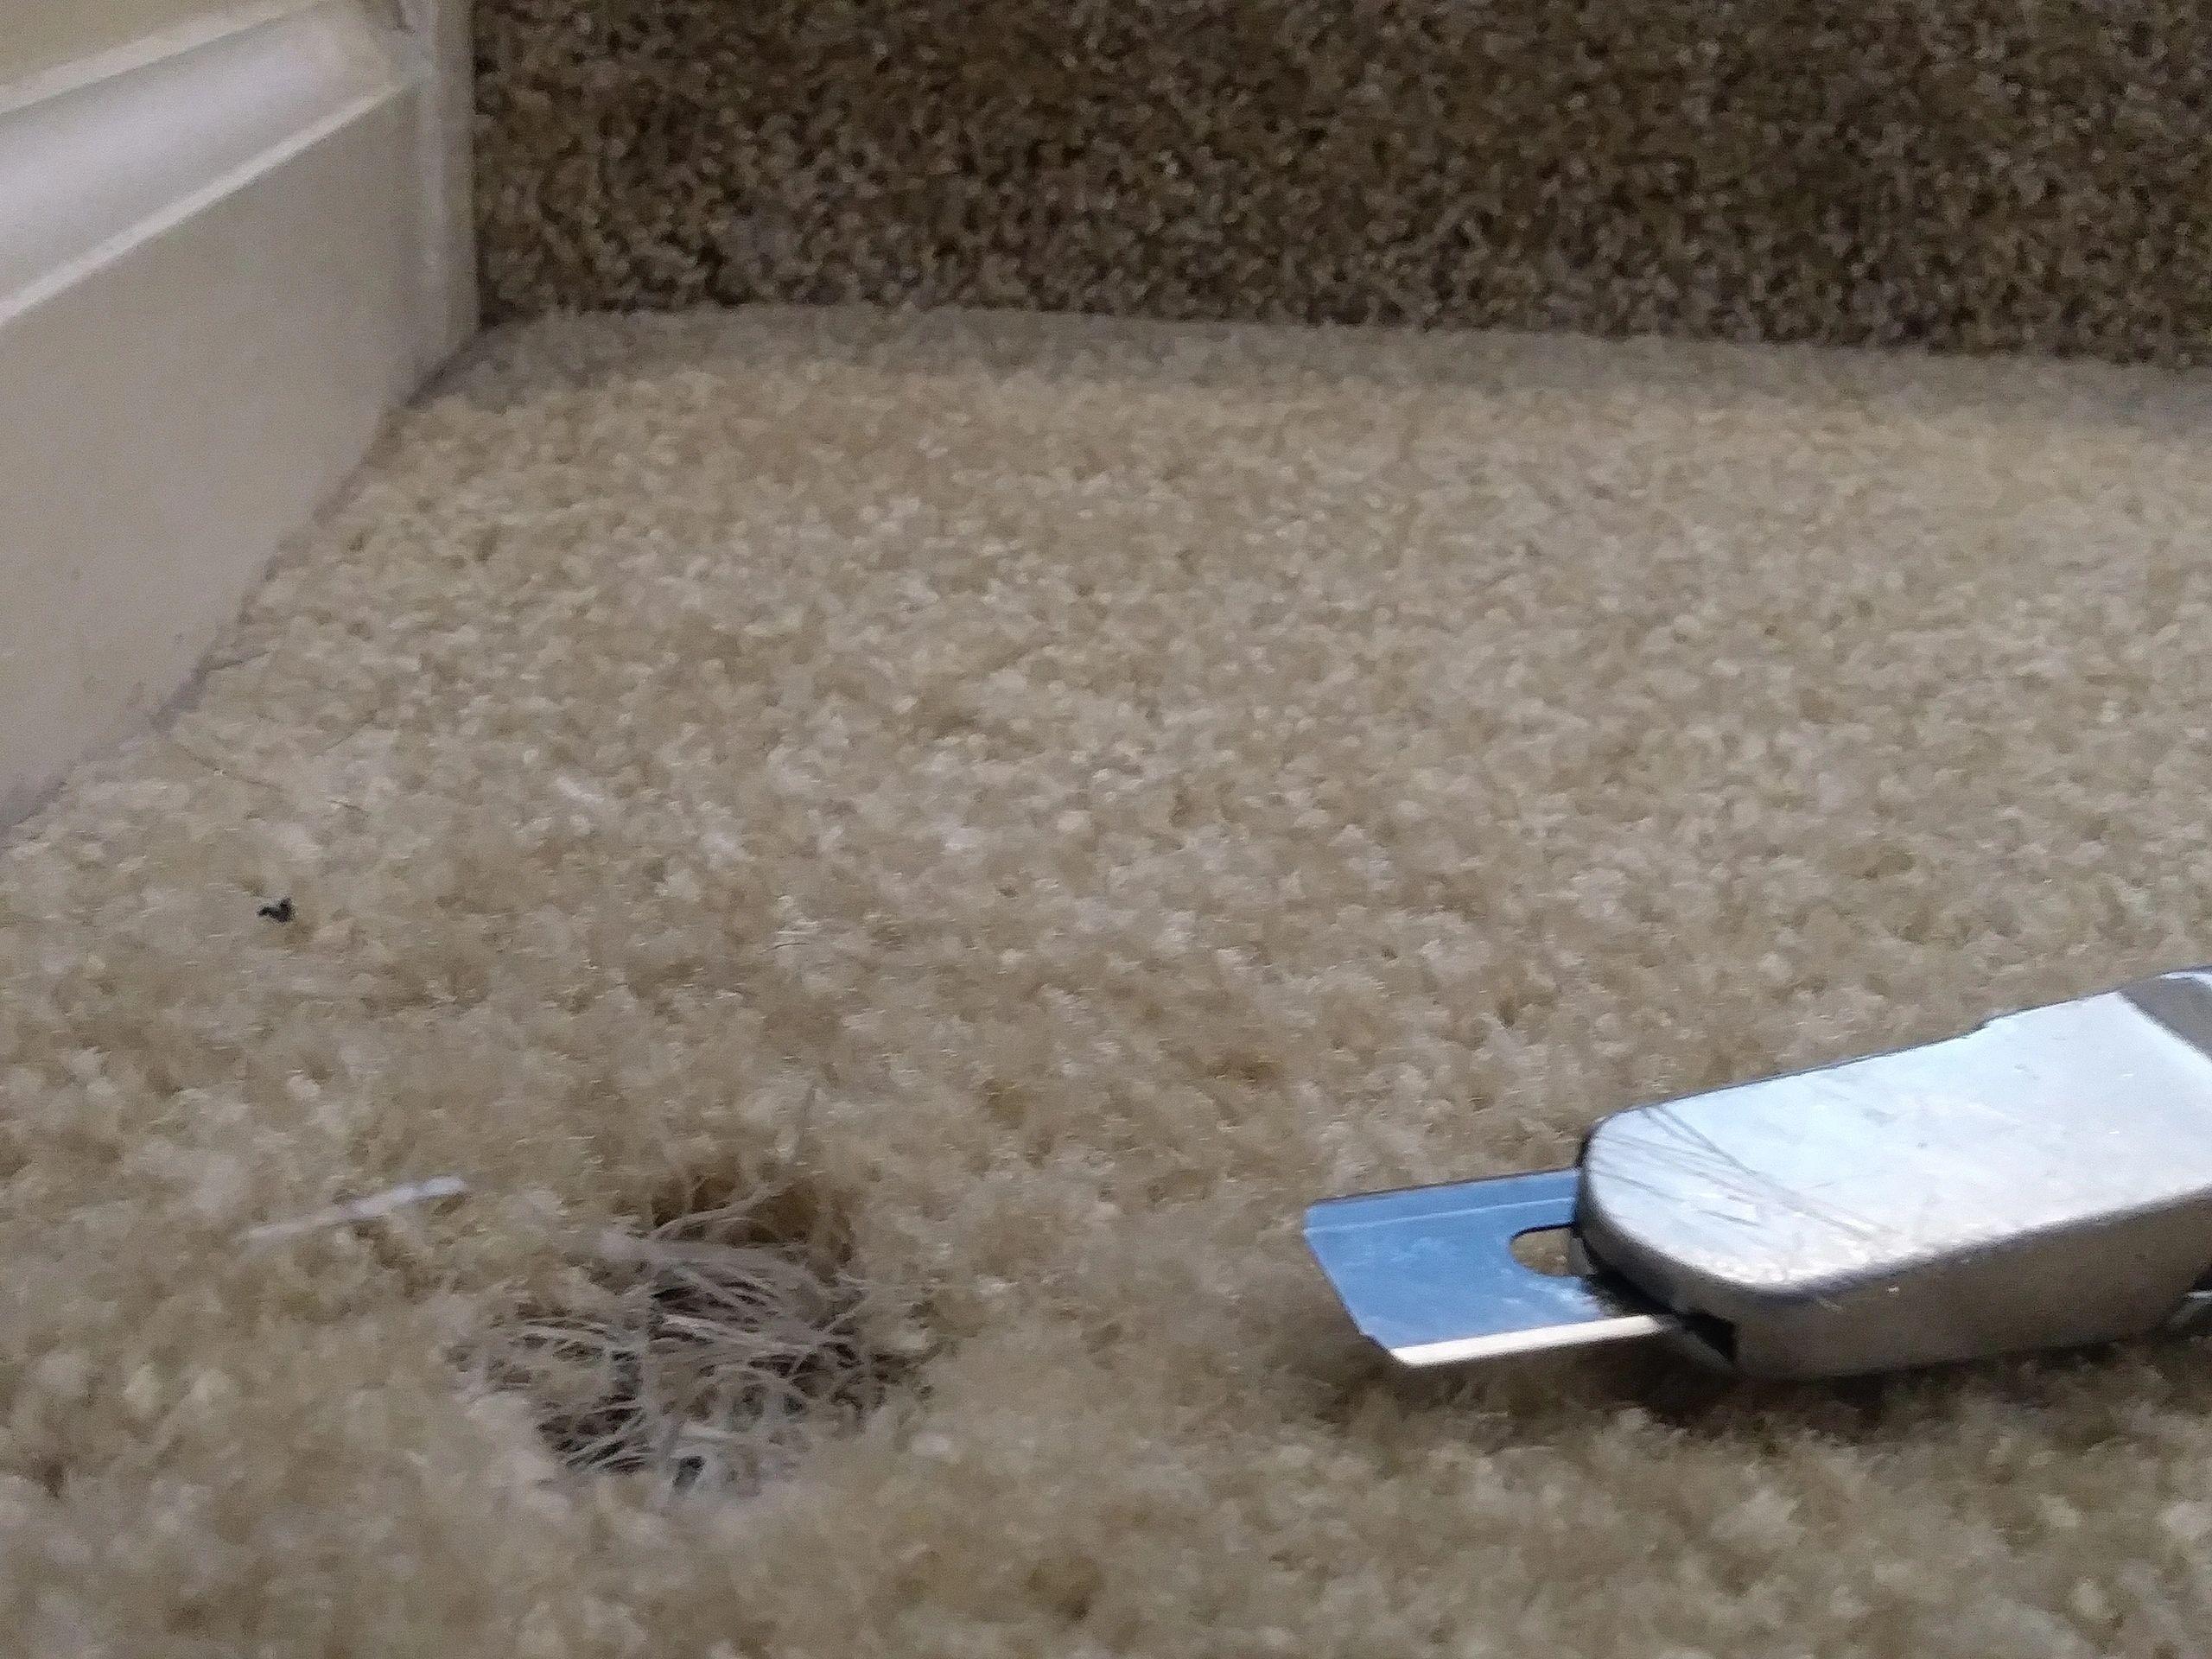 Carpet Stretching & Carpet Repairs In Cary NC